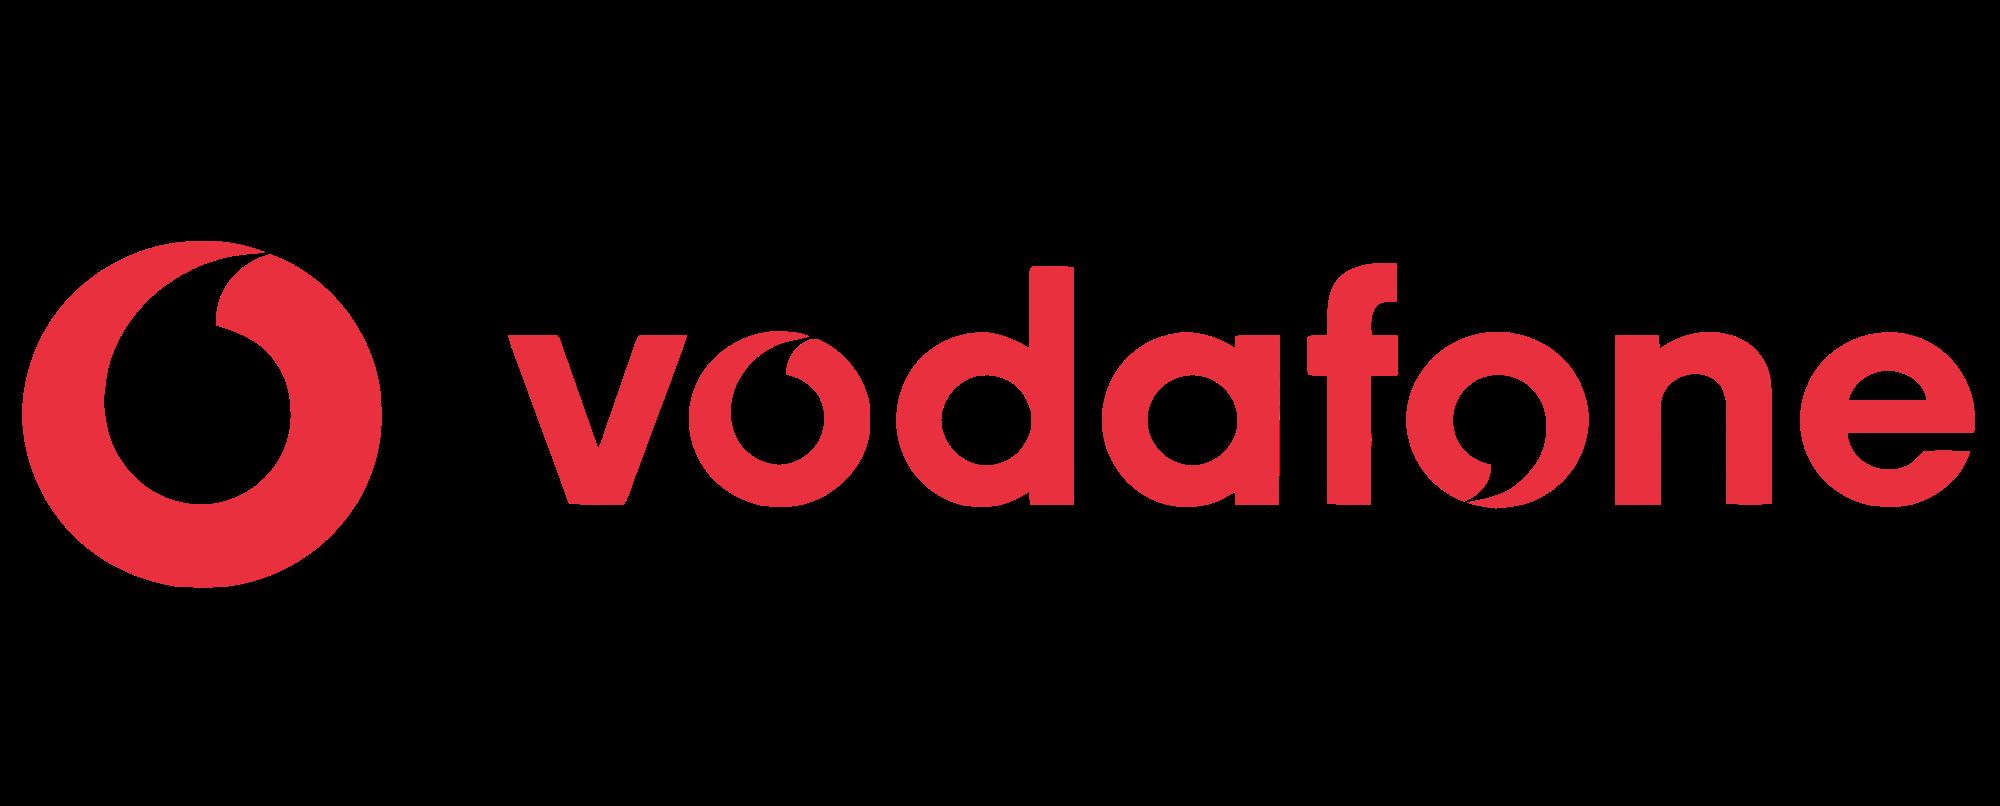 NEW VODAFONE LOGO 2018 PNG - EDigital